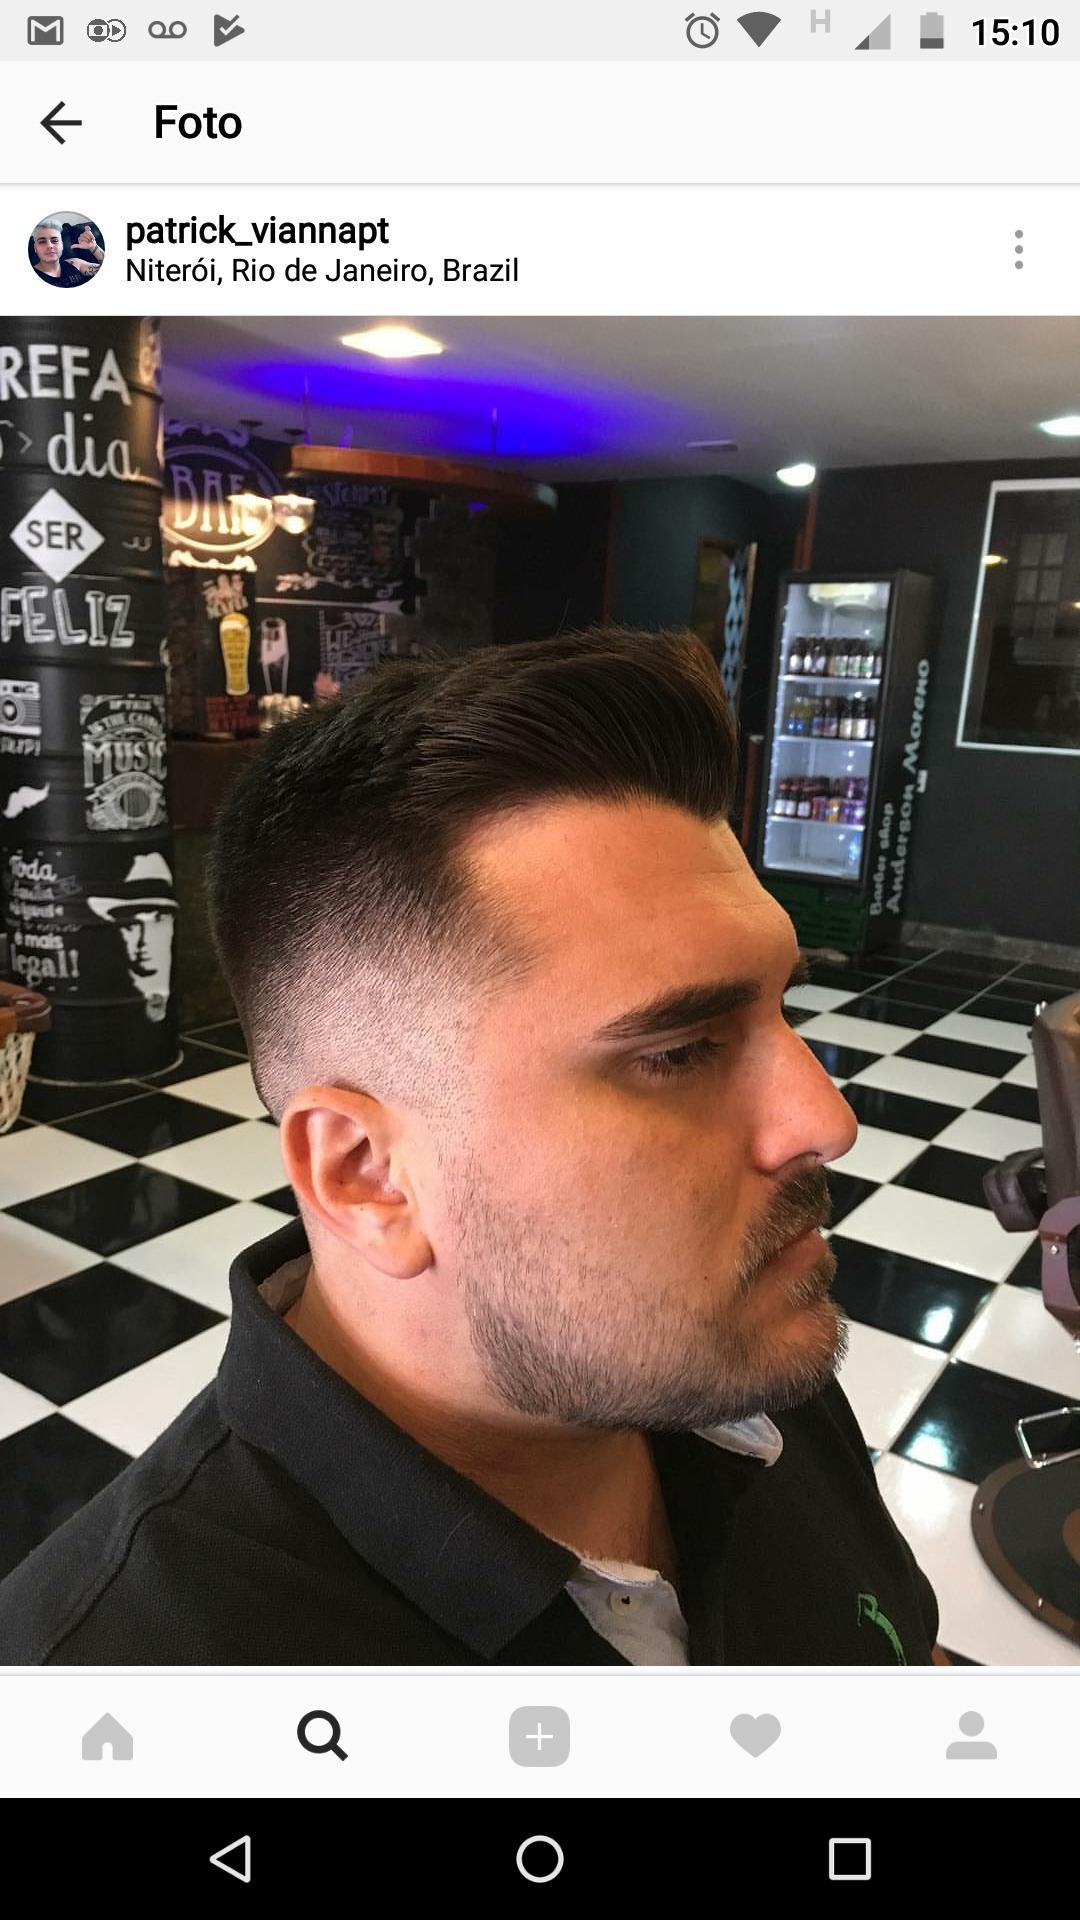 #cliente satisfeito = eu feliz cabelo barbeiro(a)